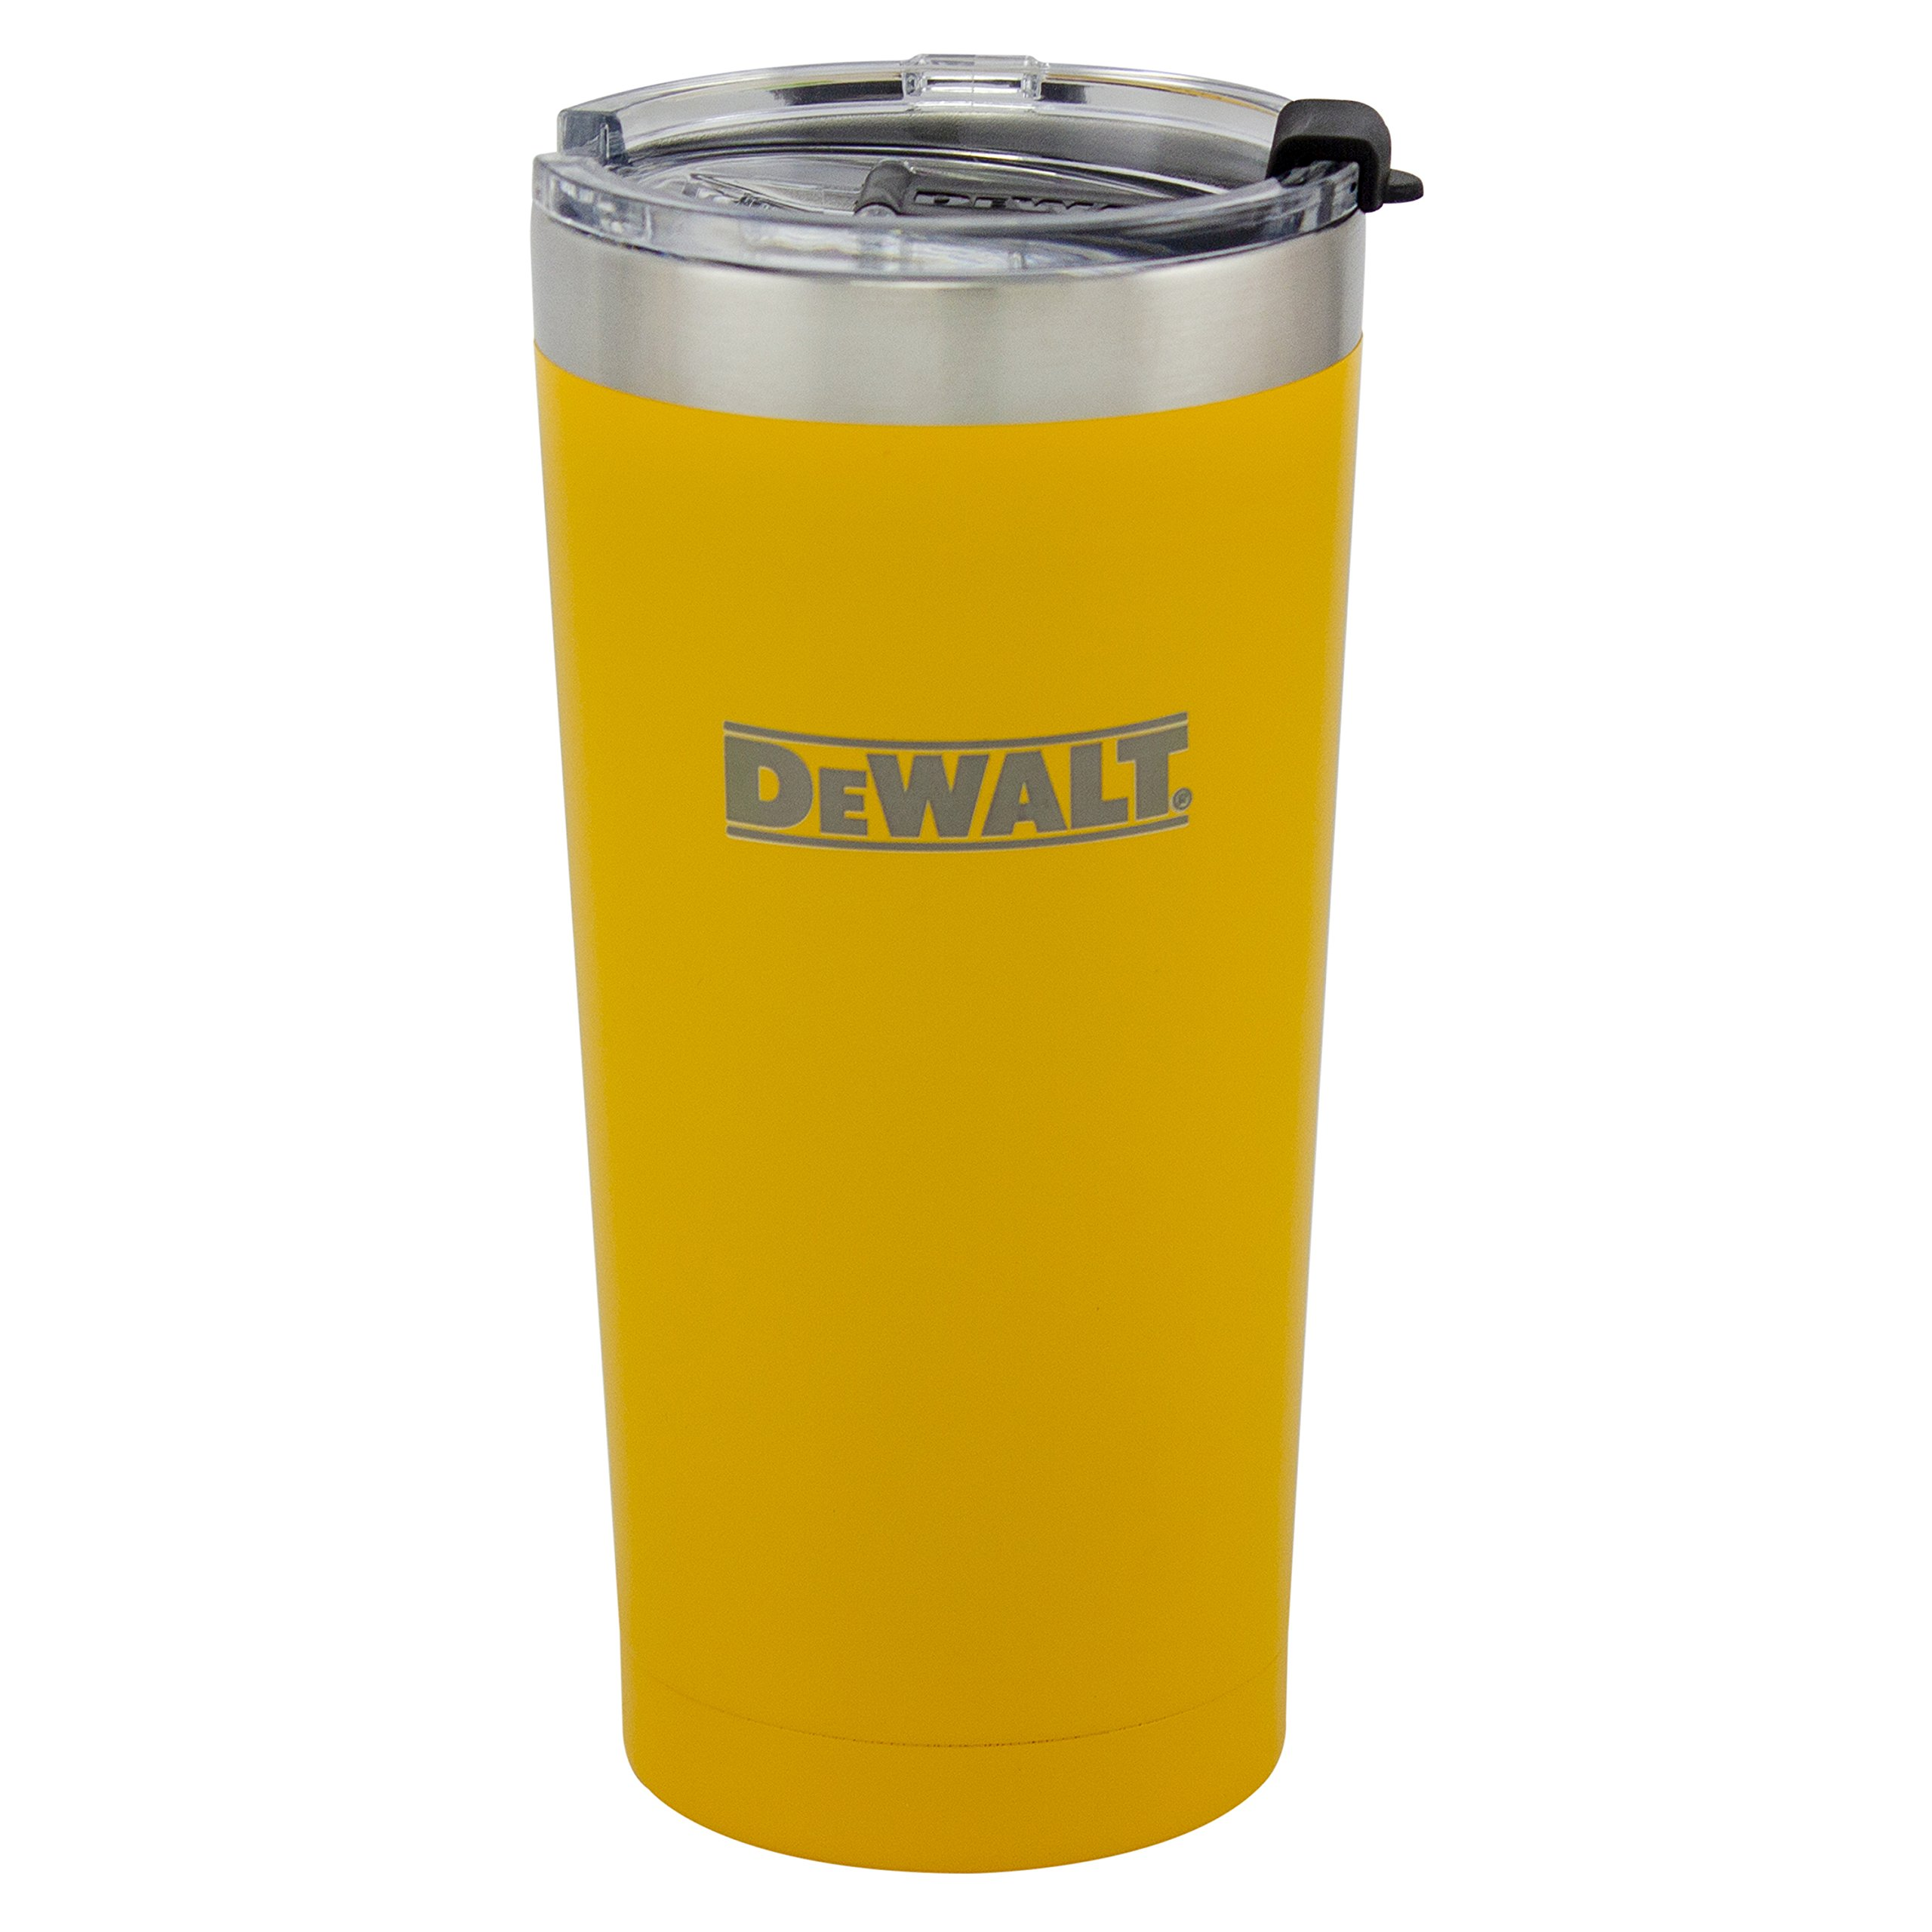 DEWALT Stainless Steel Tumbler, Yellow, 20 Ounce